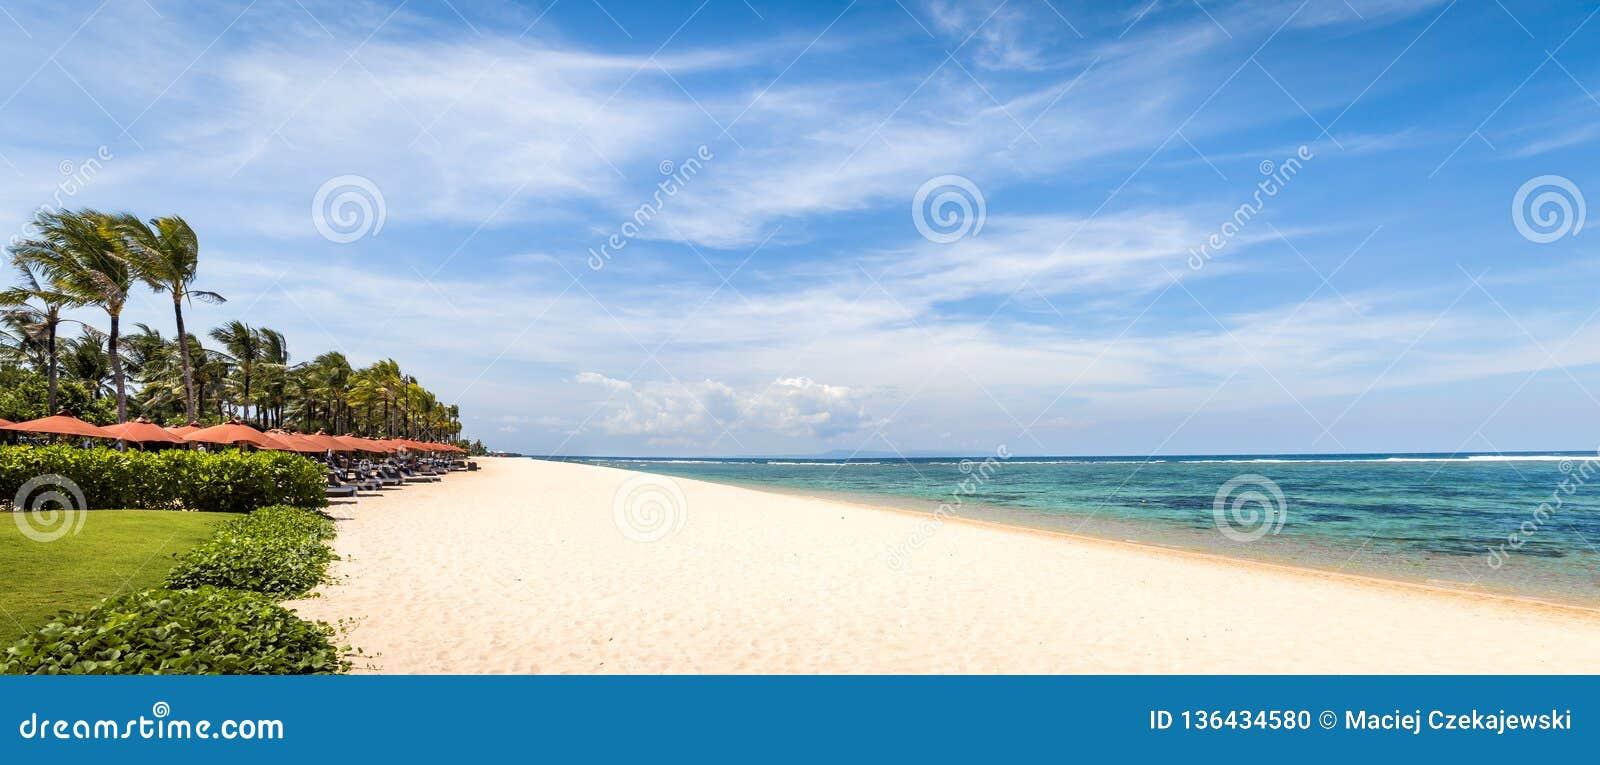 Geger Beach On Bali Island Stock Photo Image Of Asia 136434580